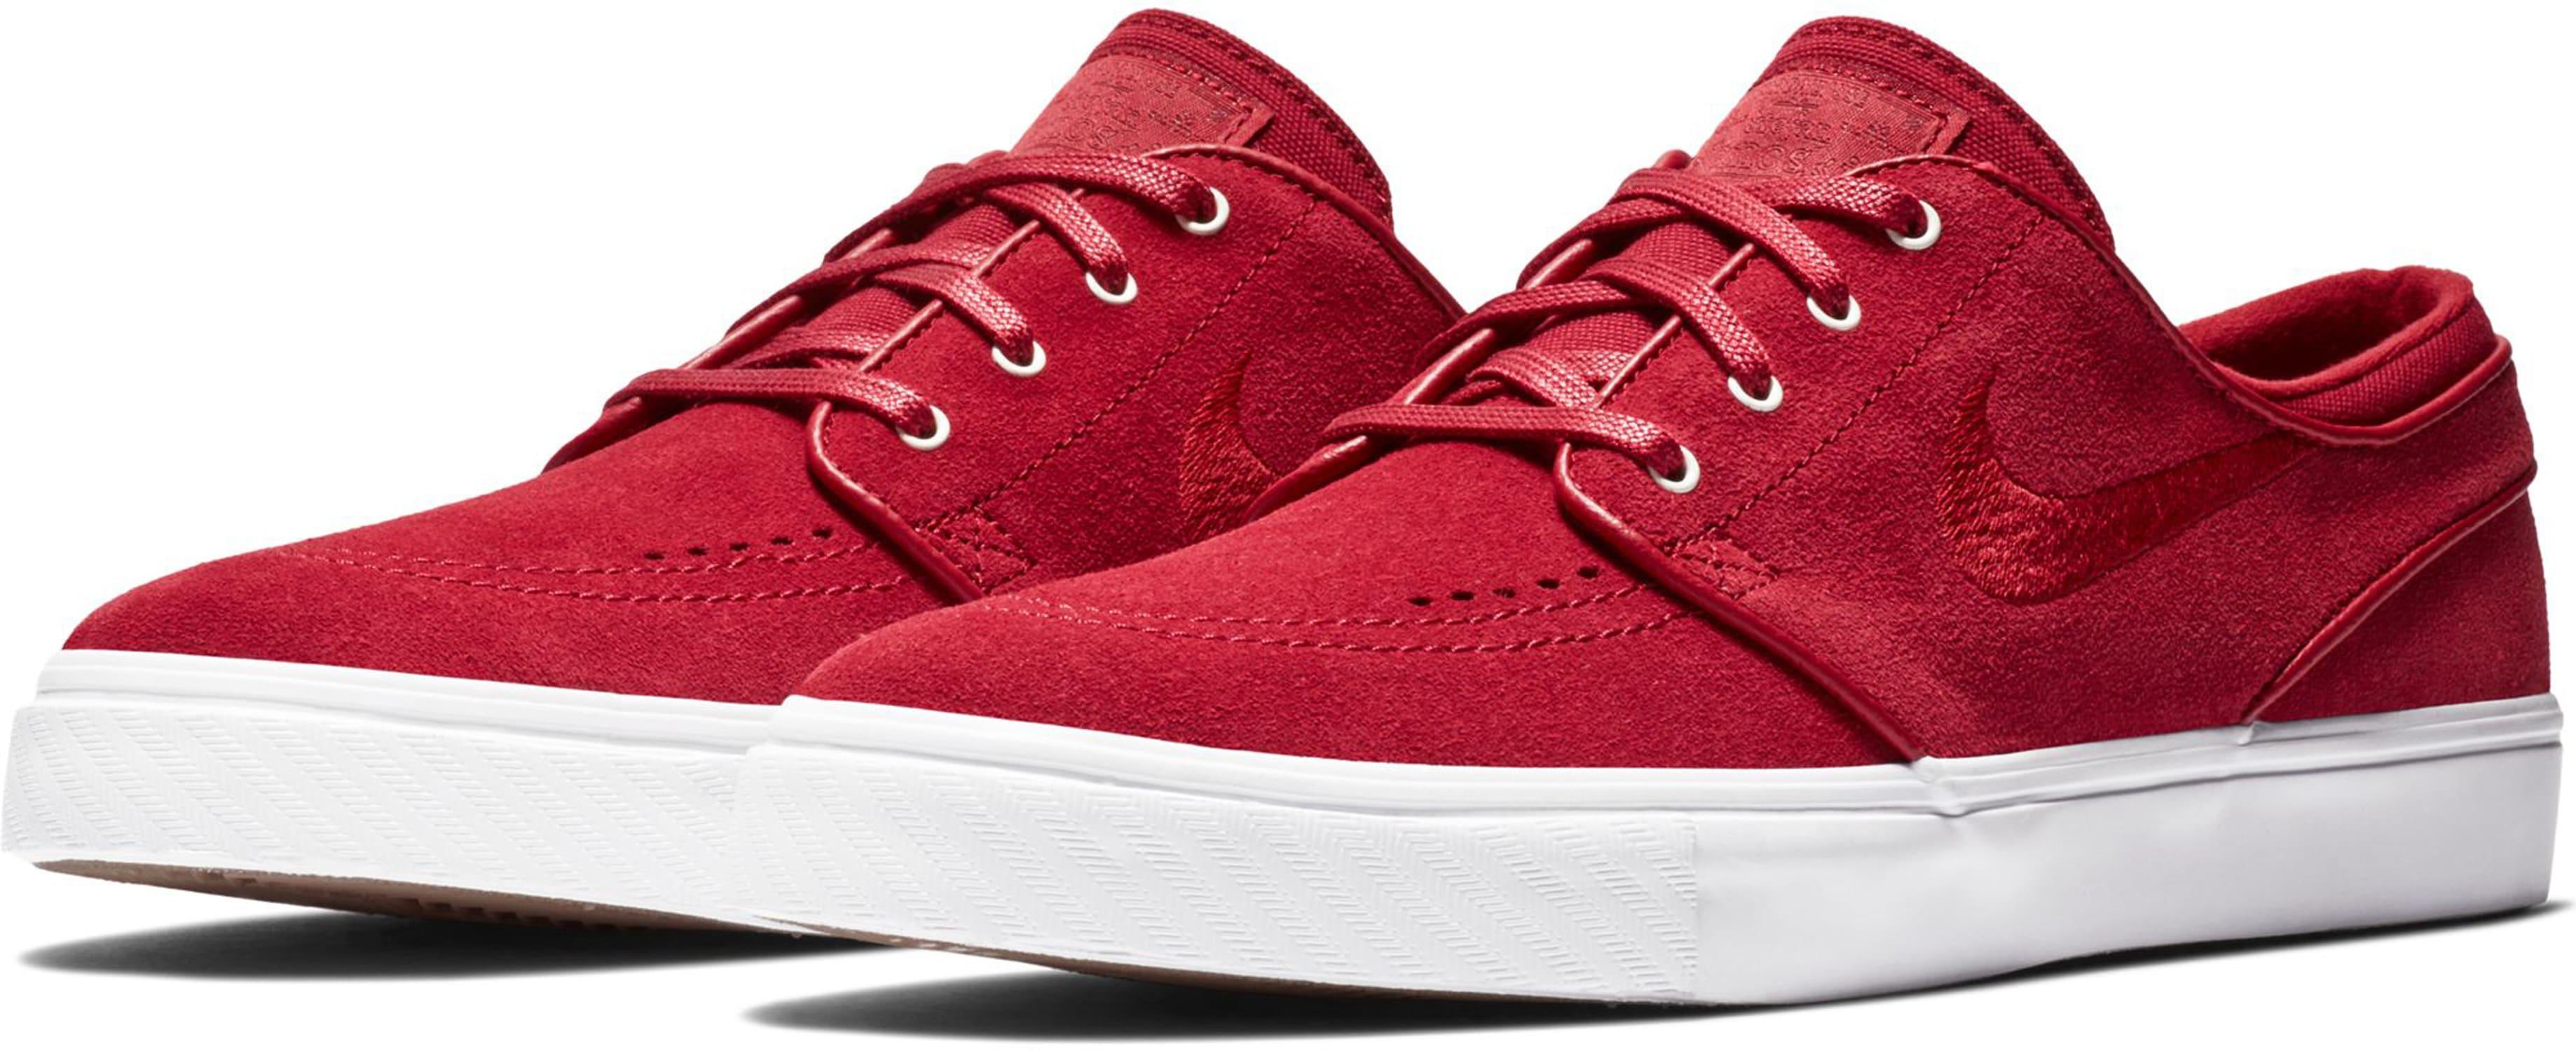 bf82de553ee6 Nike SB Zoom Stefan Janoski Skate Shoes - thumbnail 3